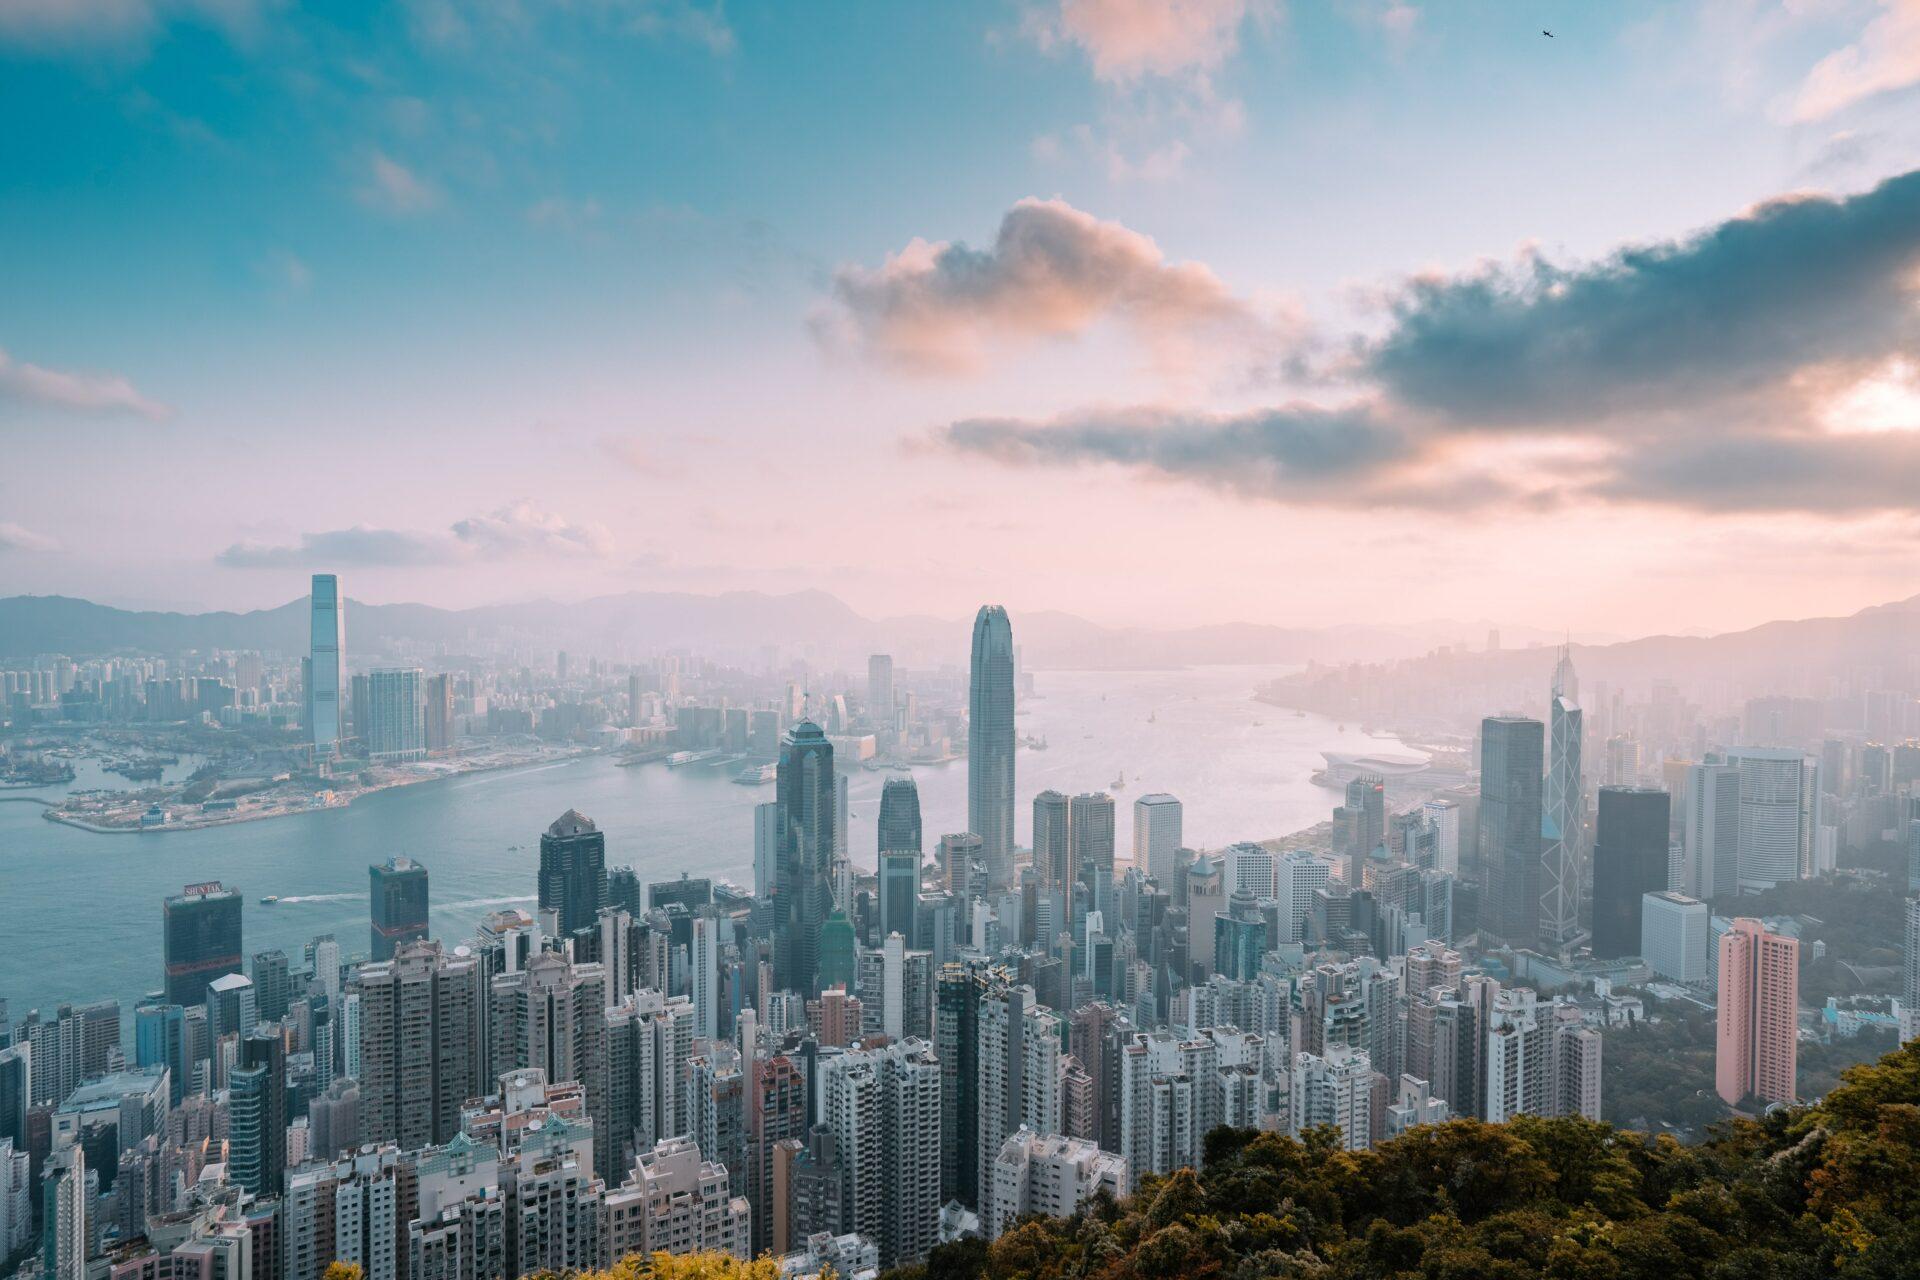 Hong Kong - Asia - Sustainable Travel - TravelBlog - Belgium - TravelRebel